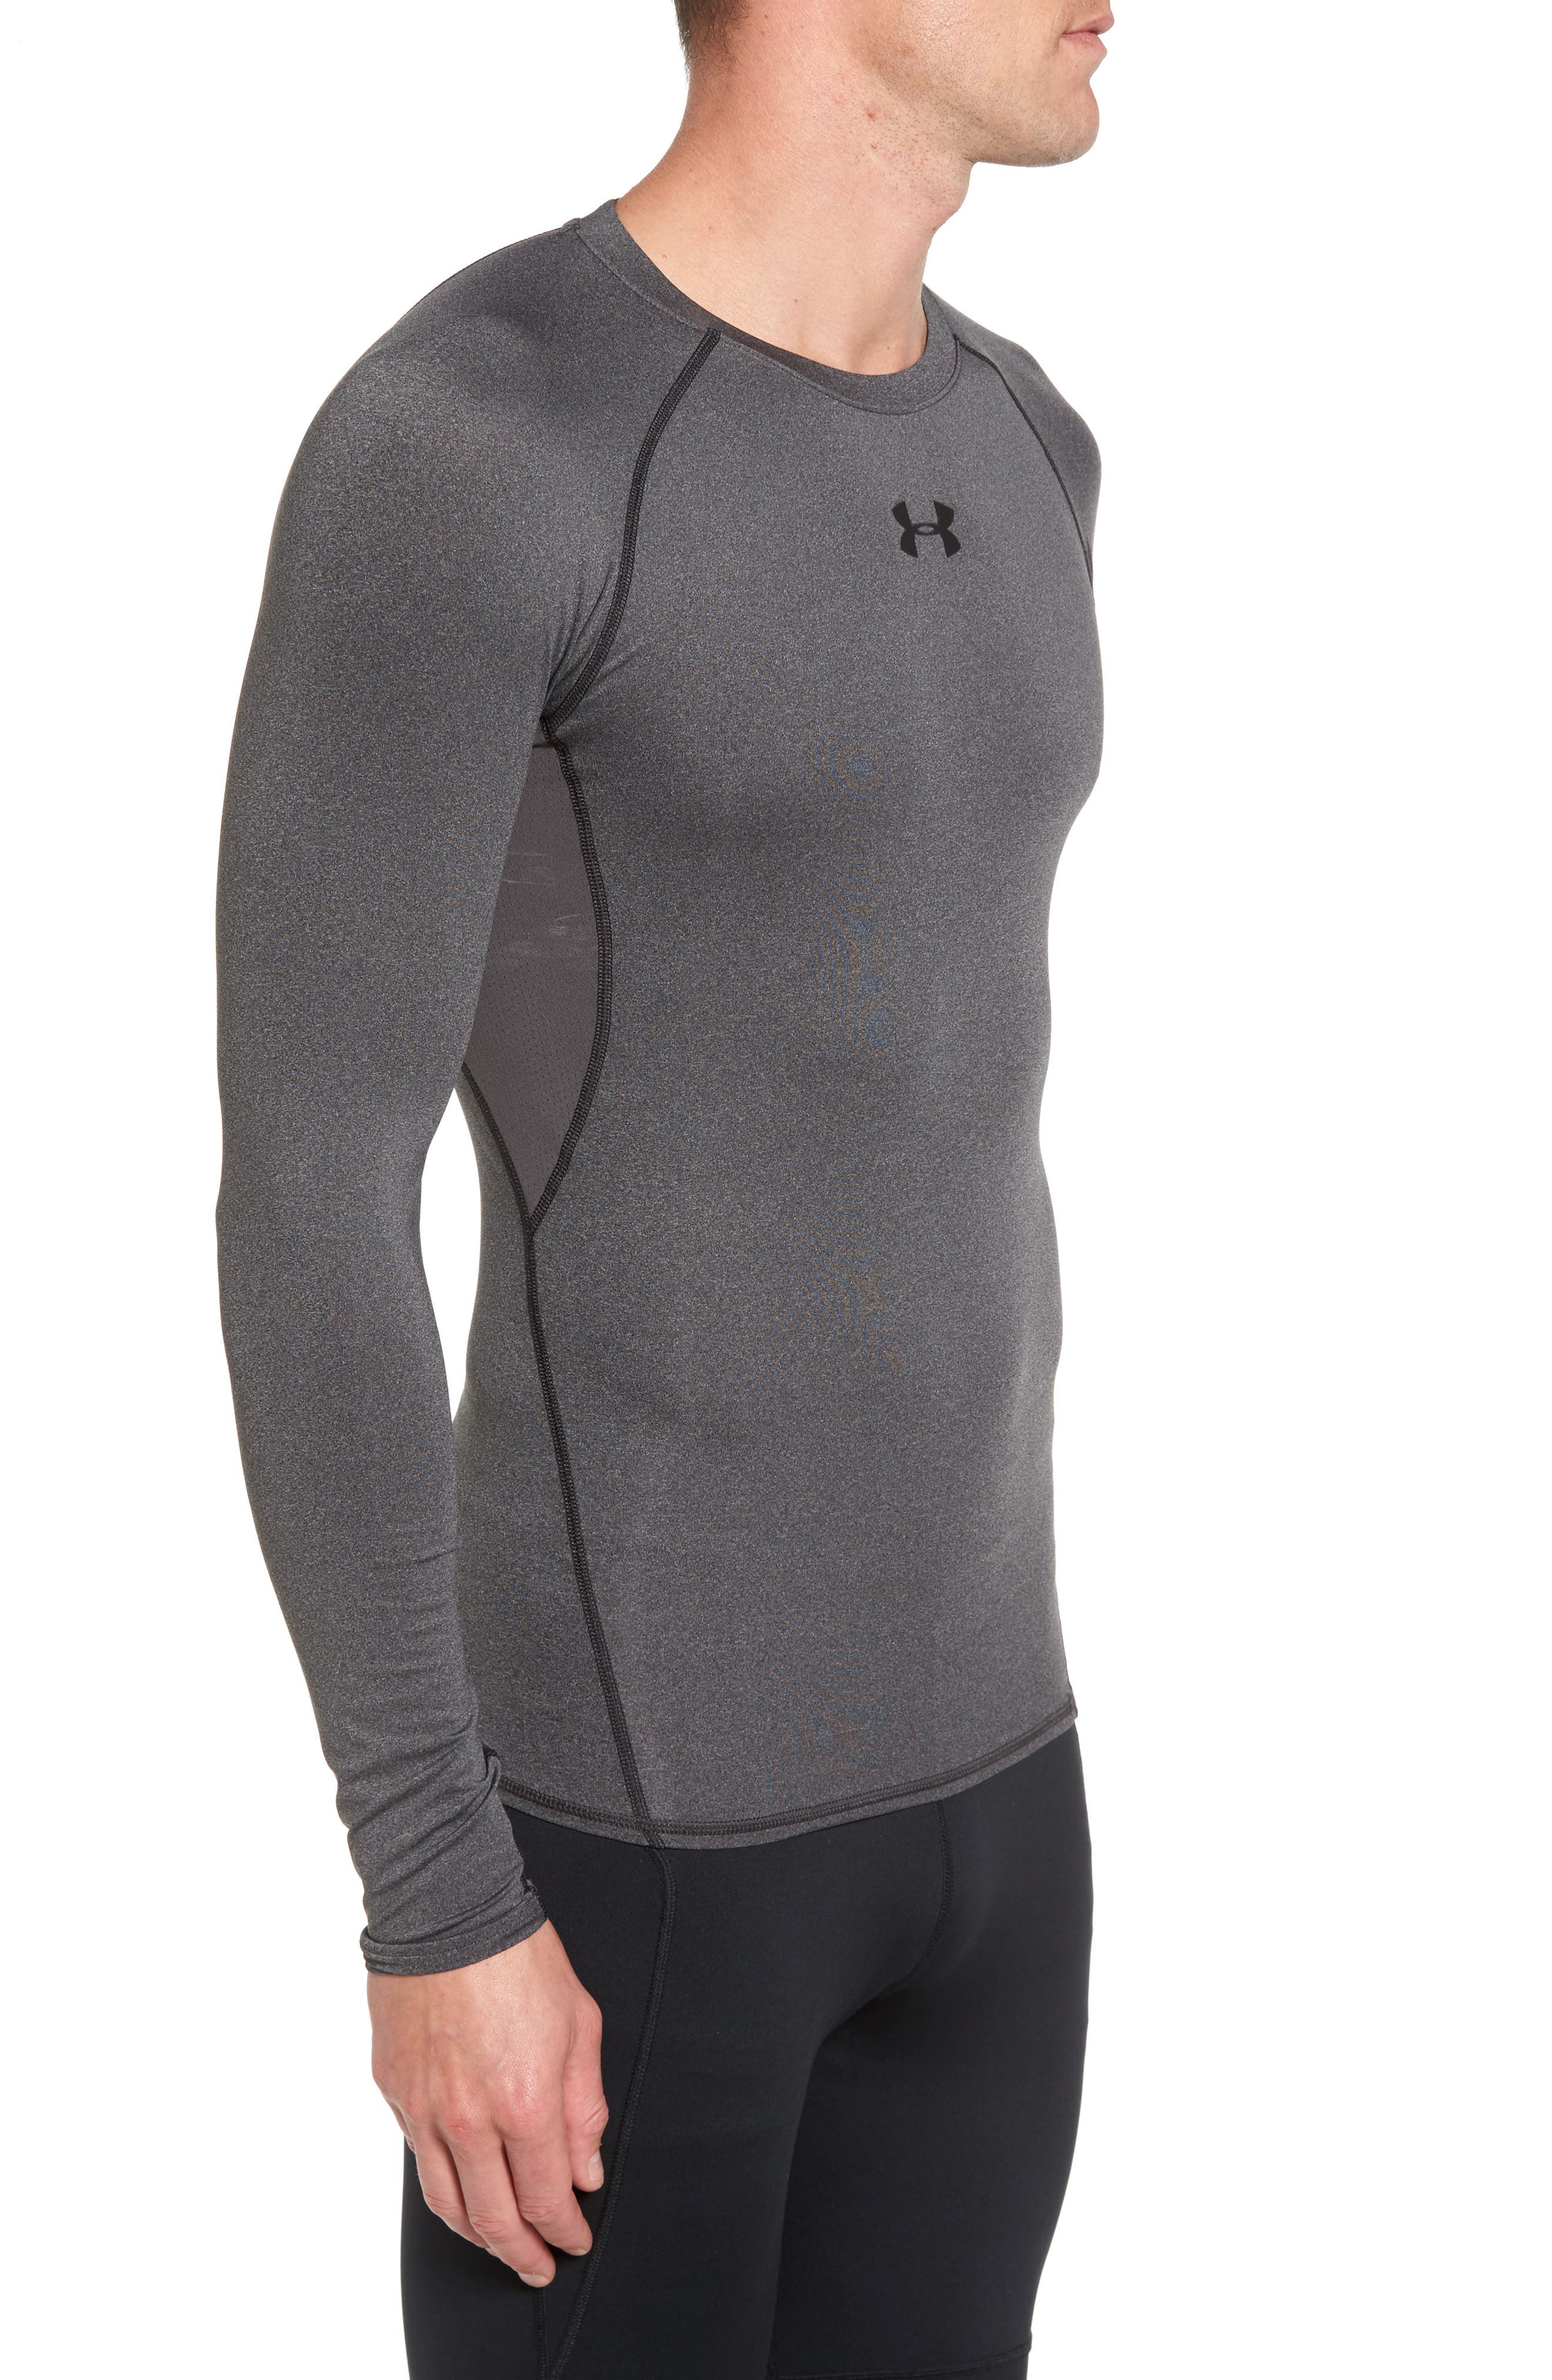 HeatGear<sup>®</sup> Compression Fit Long Sleeve T-Shirt,                             Alternate thumbnail 3, color,                             CARBON HEATHER/ BLACK